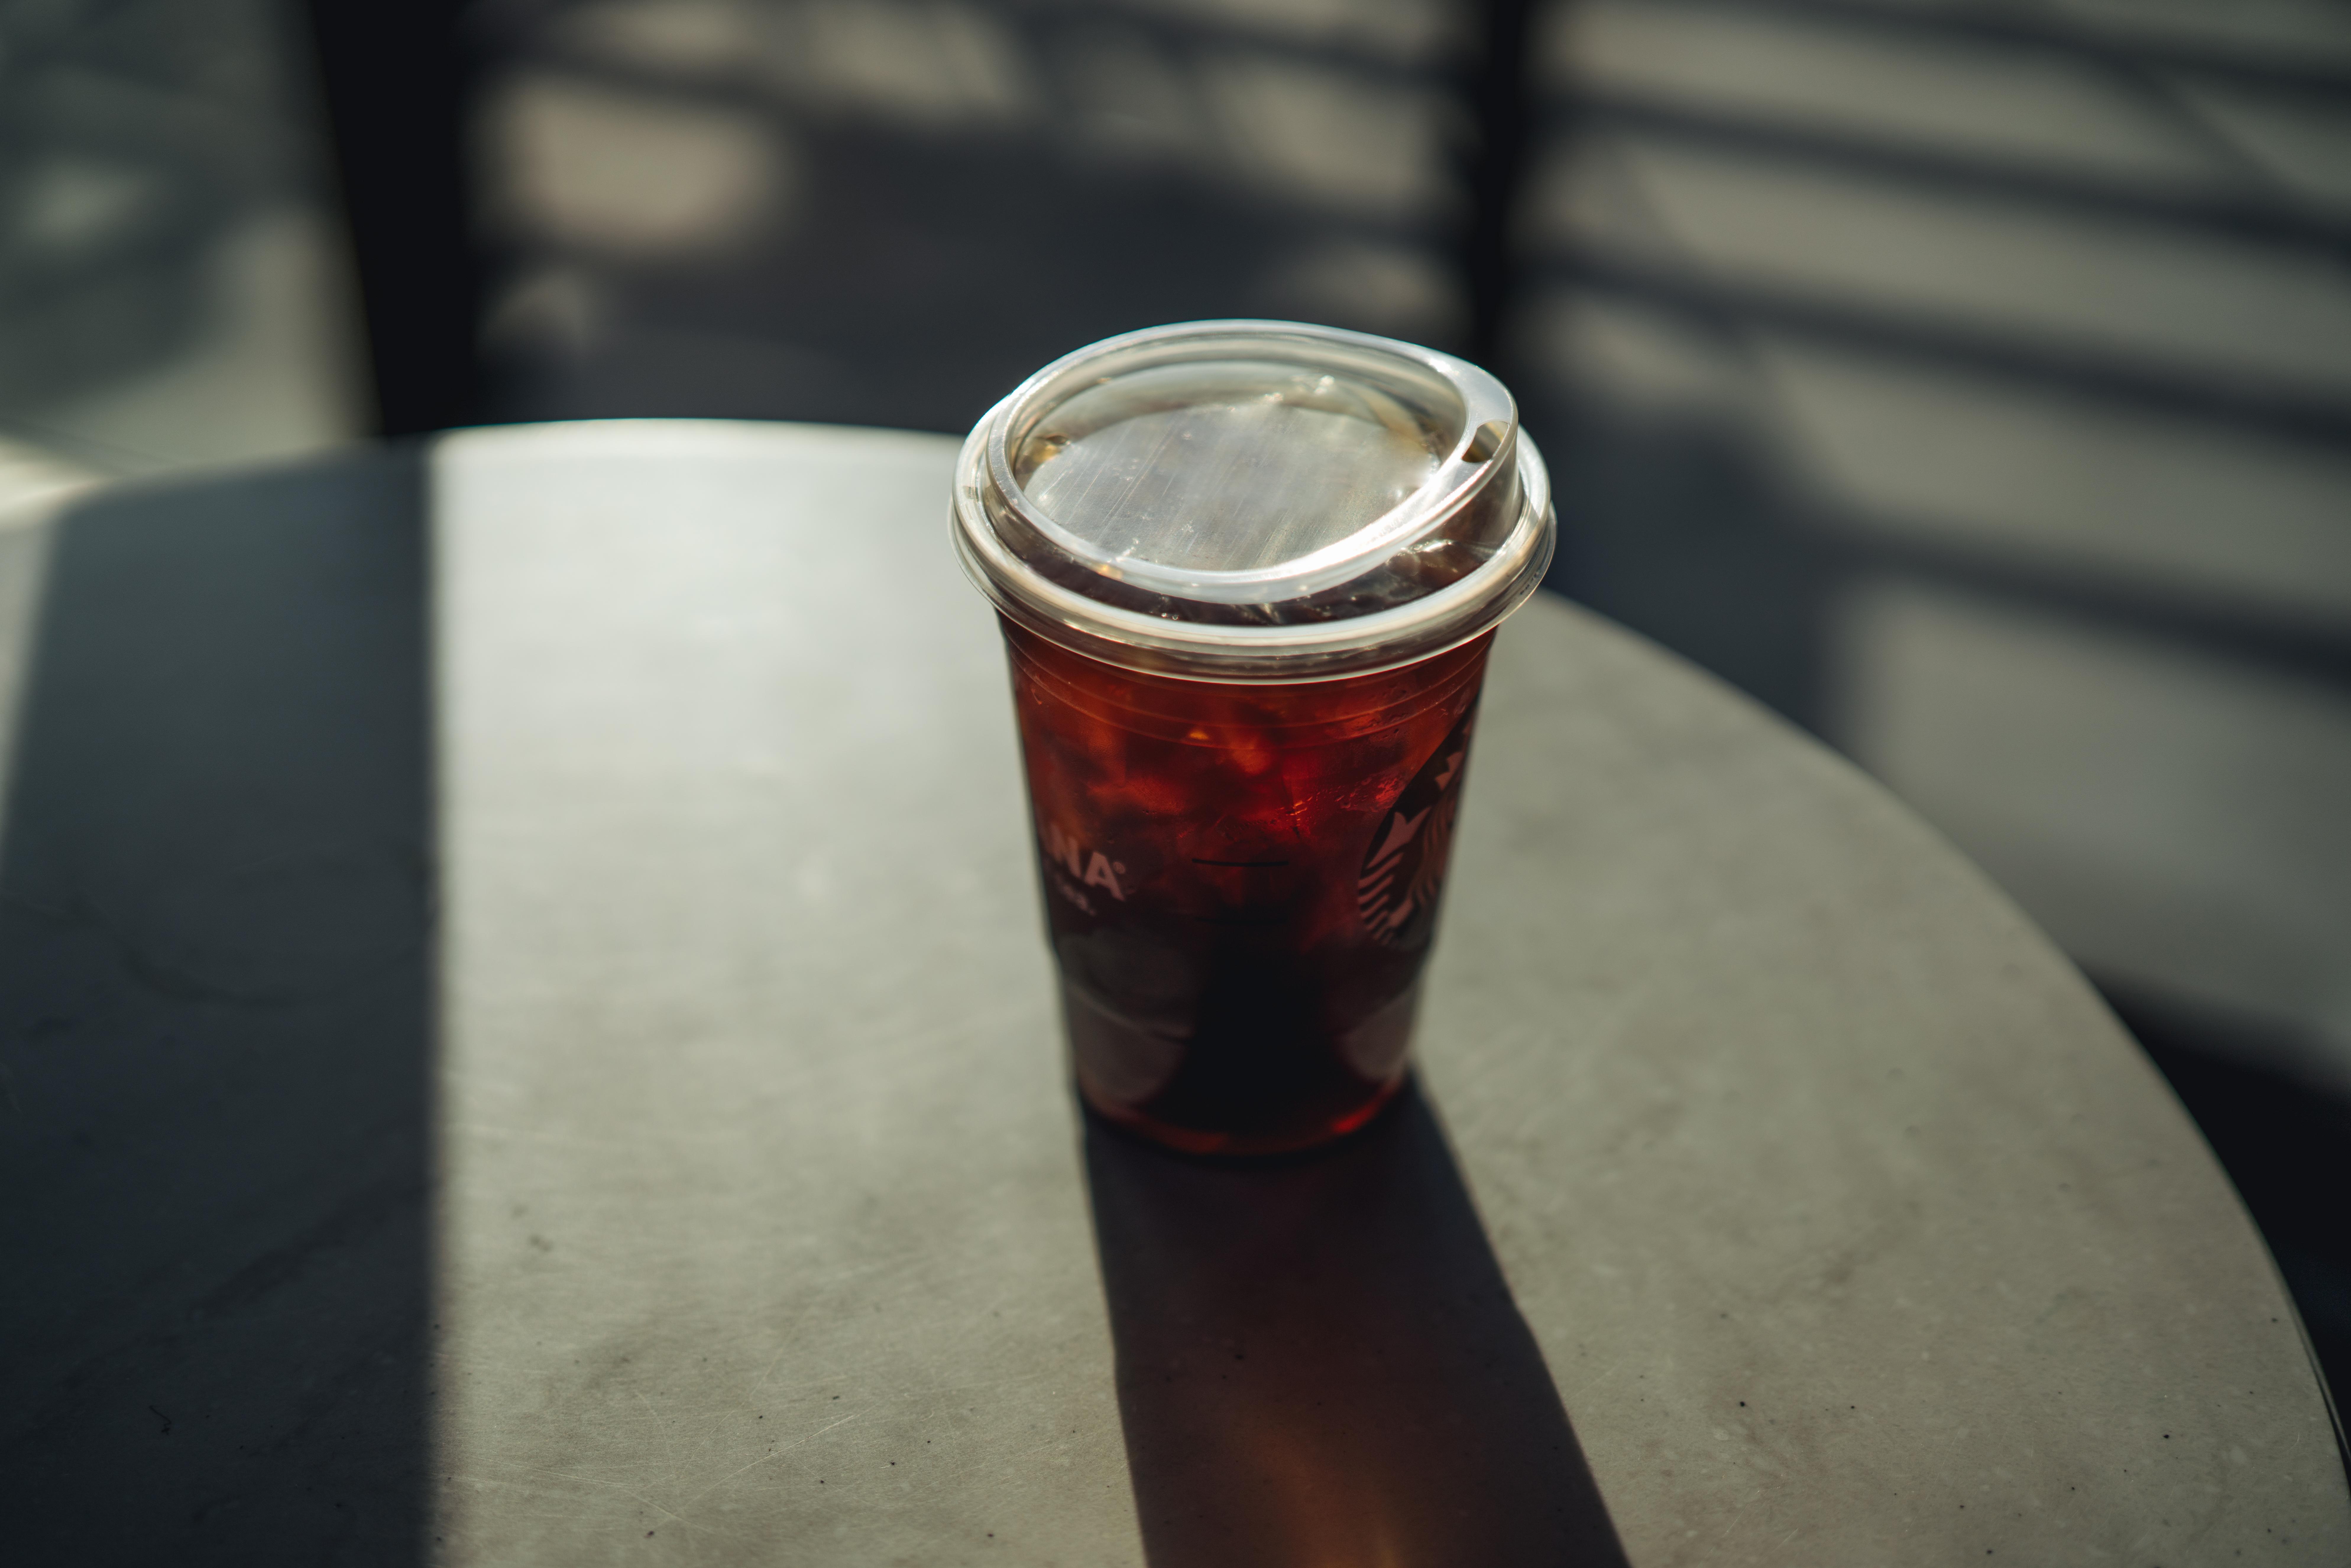 The new Starbucks lid